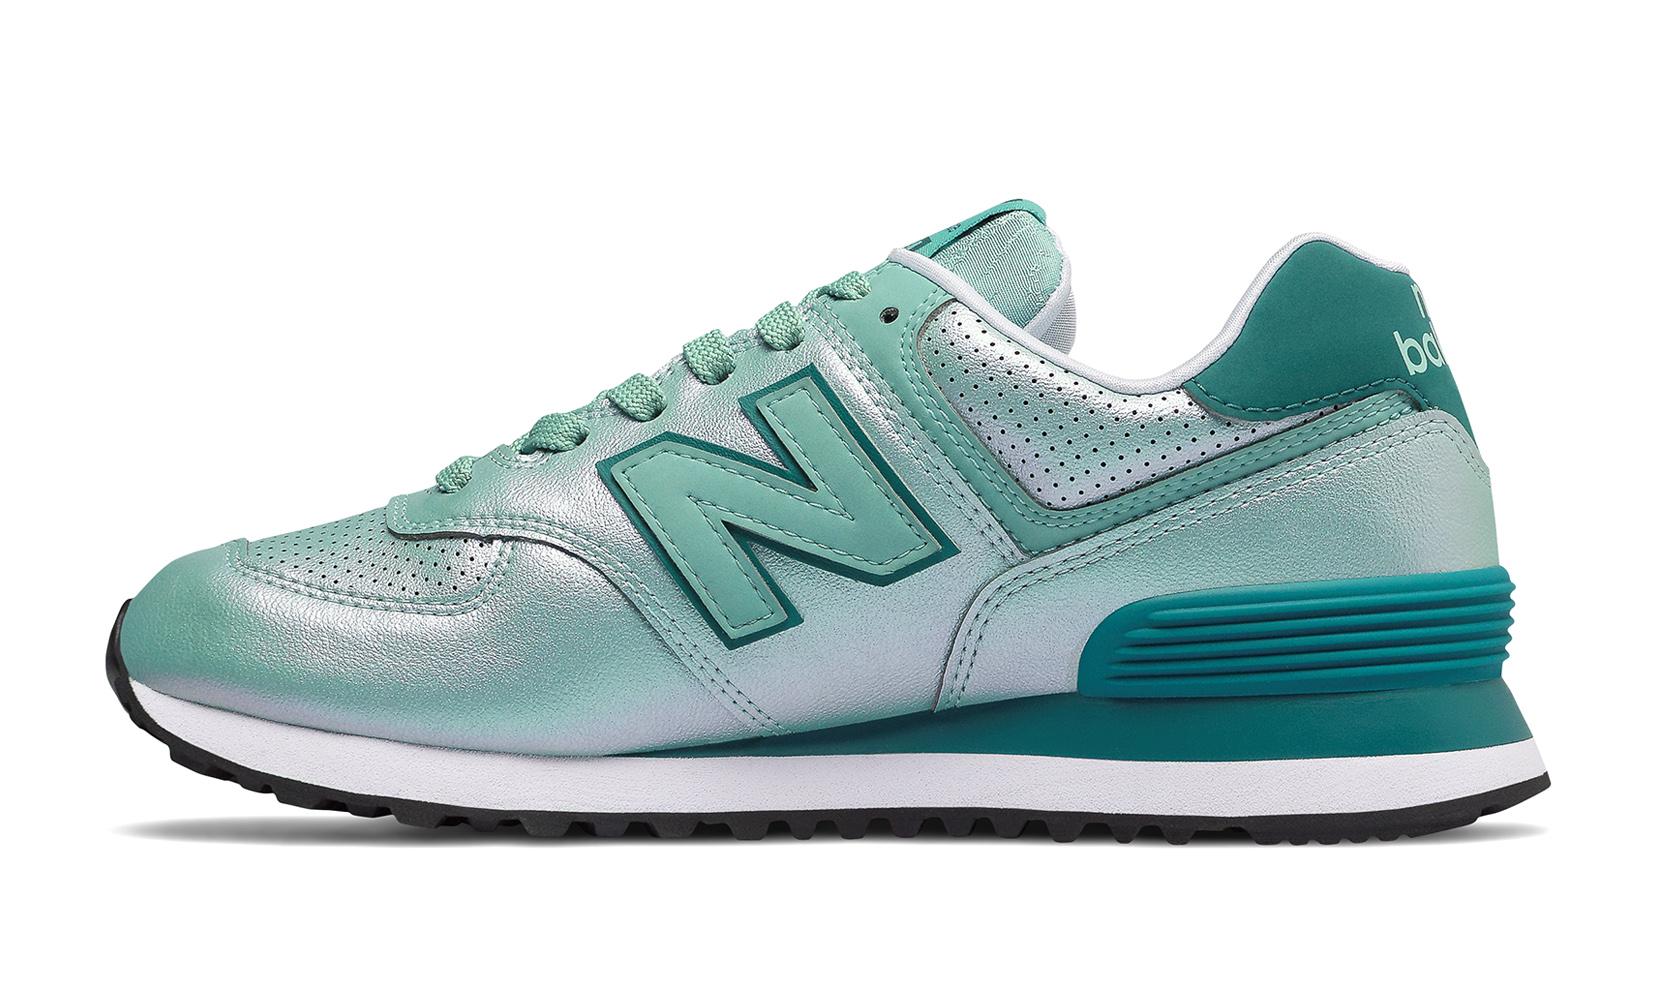 Жіноче взуття повсякденне New Balance 574 Sheen Pack WL574KSA | New Balance